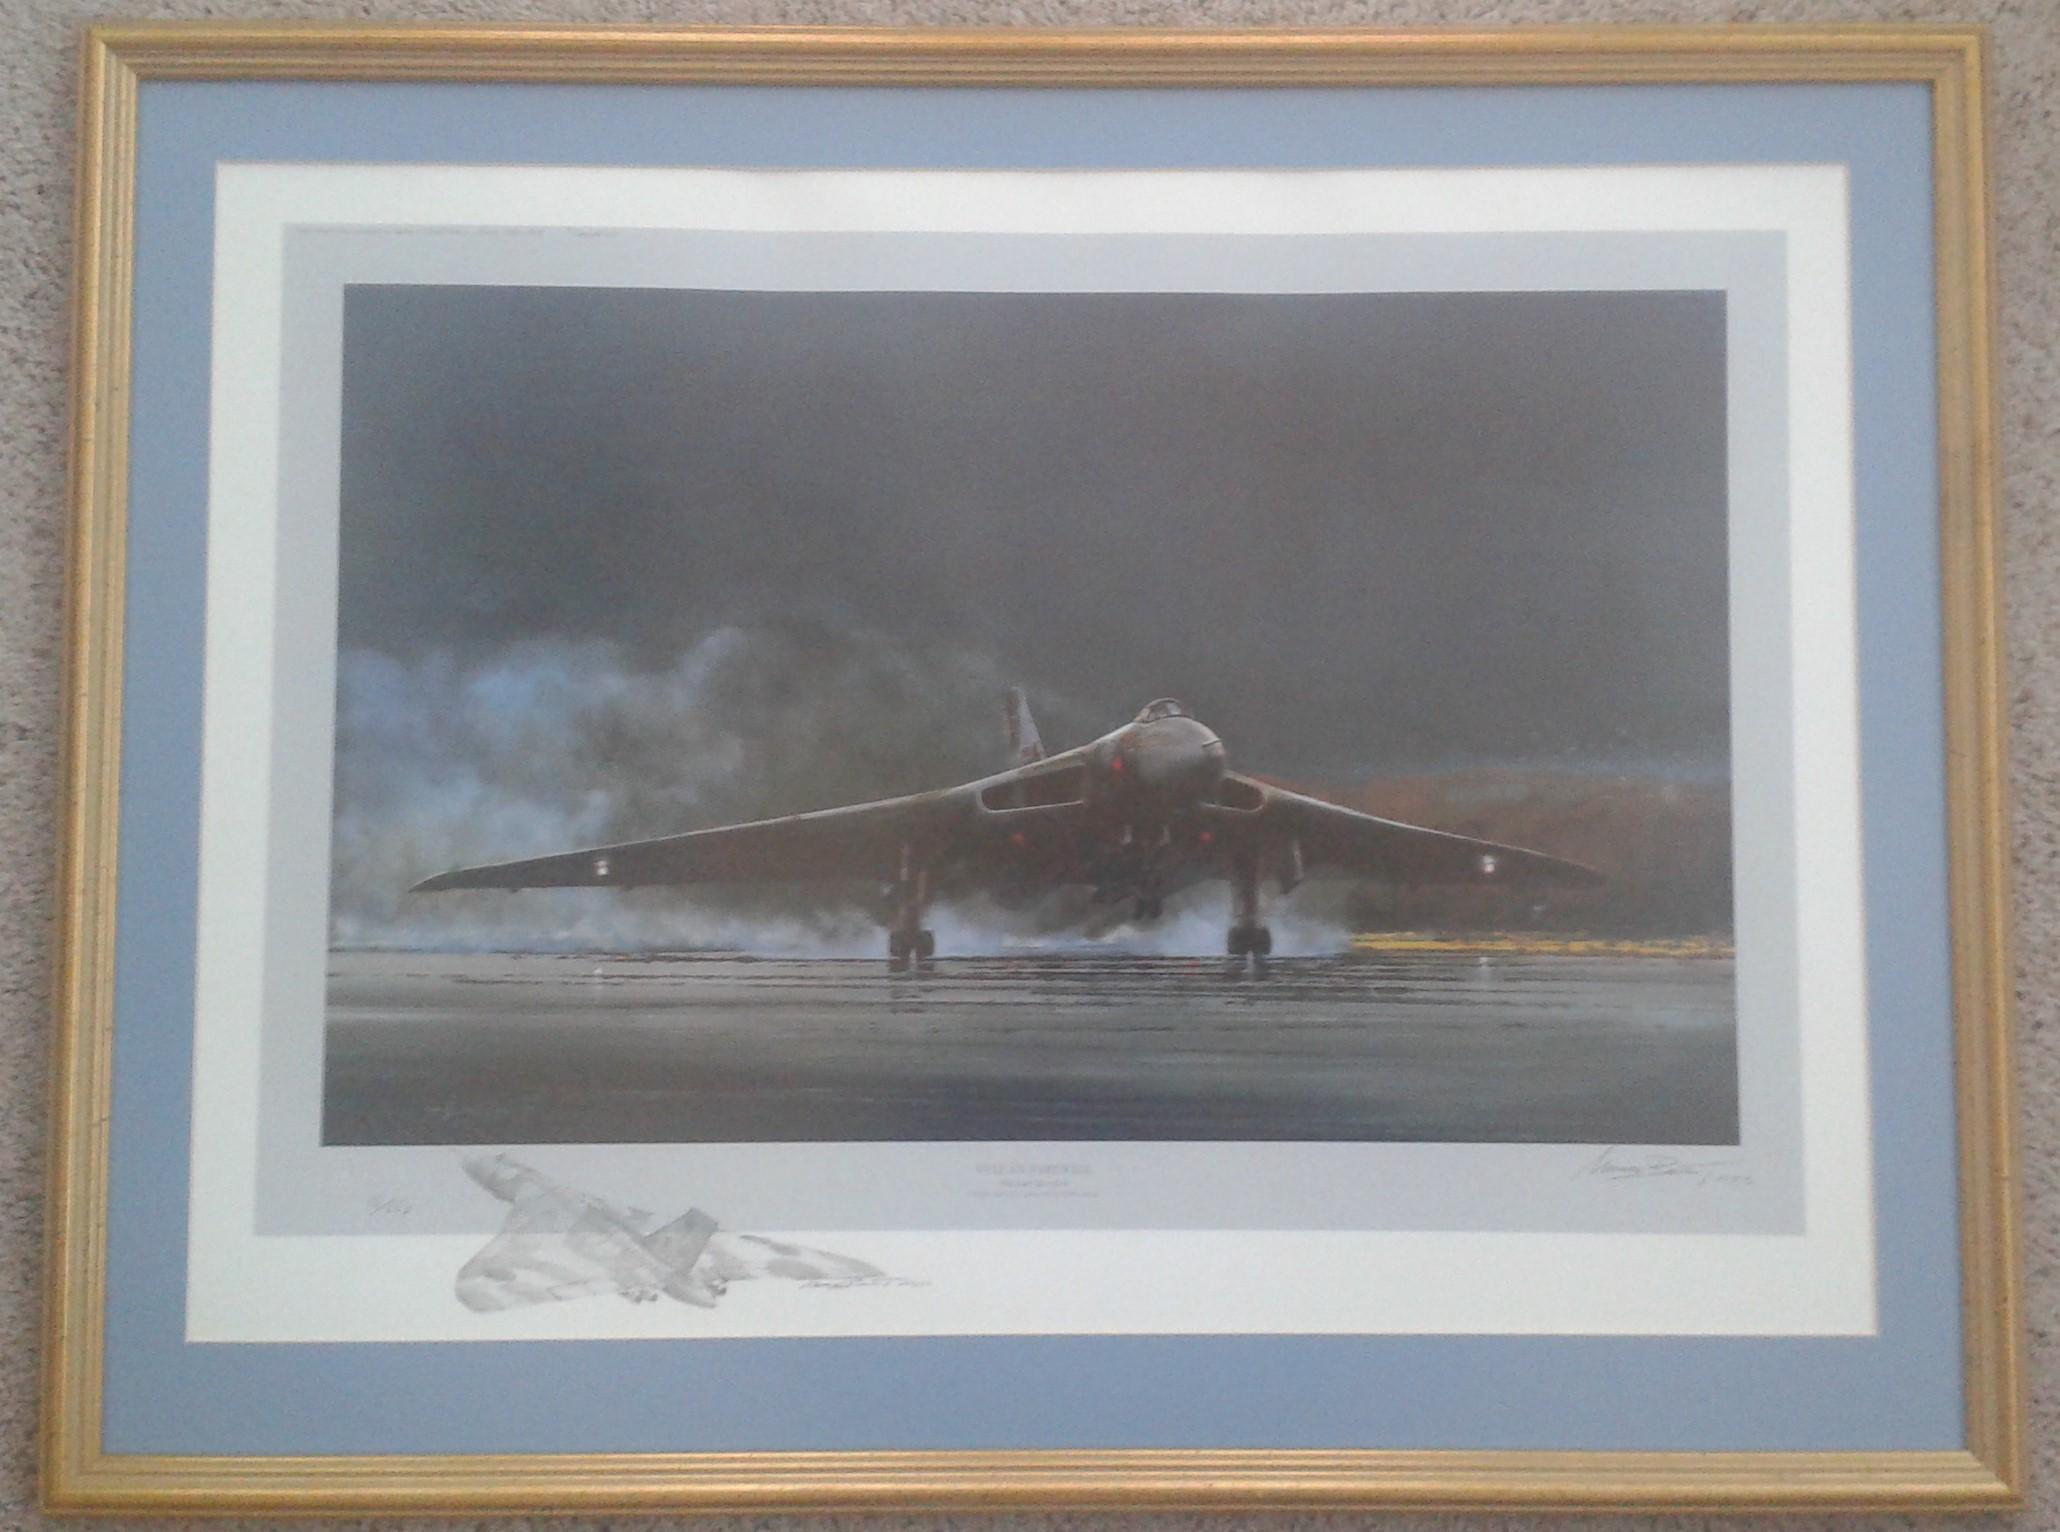 Vulcan Farewell Remarque-Michael Rondot